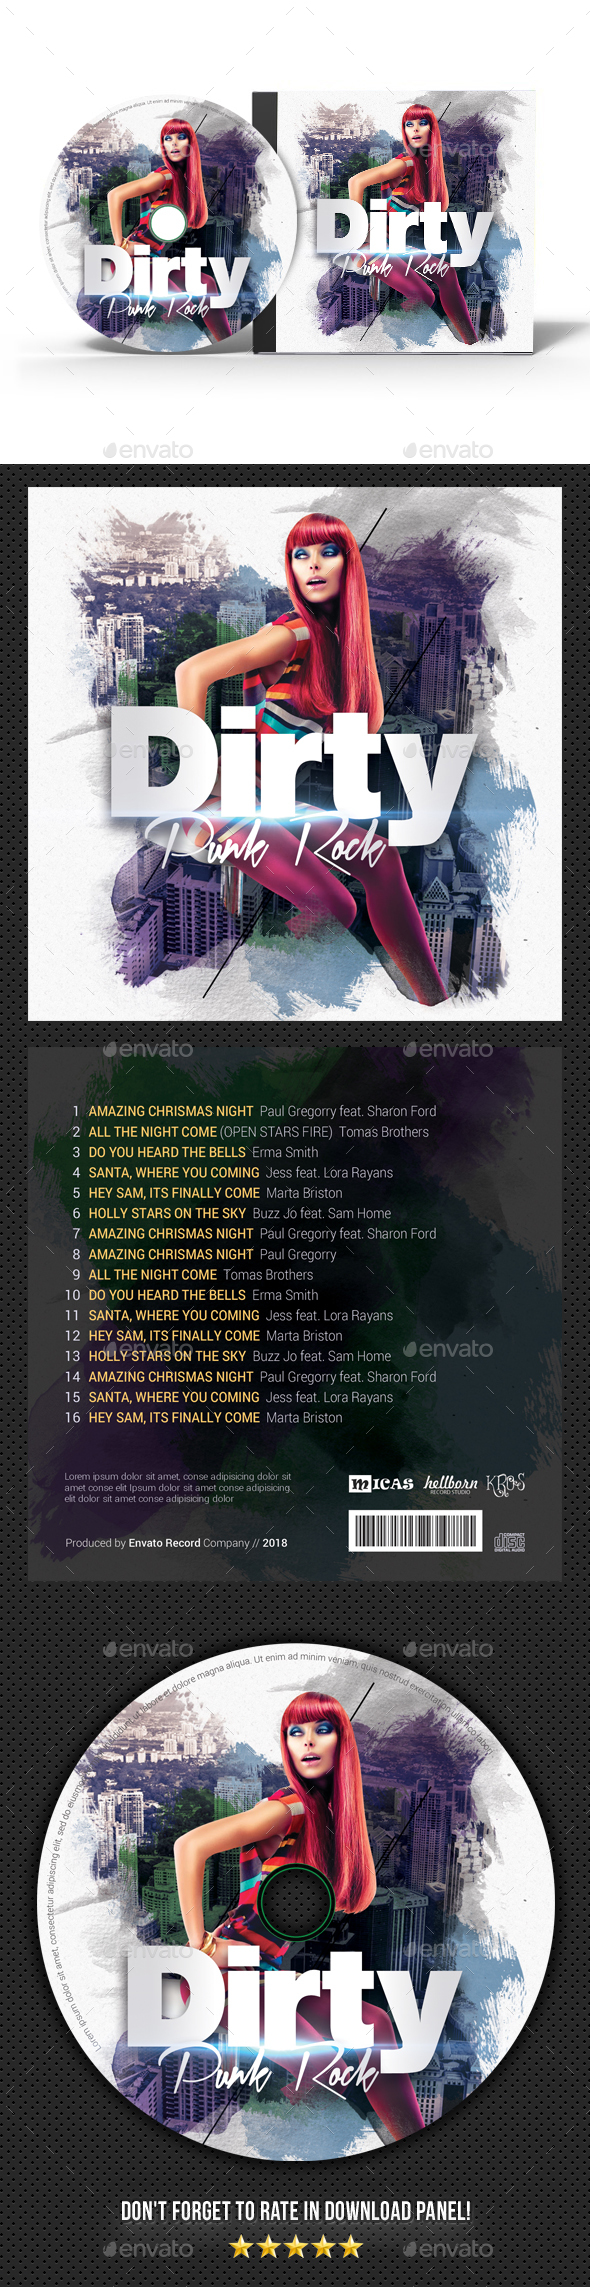 Dirty Punk Rock CD Cover - CD & DVD Artwork Print Templates